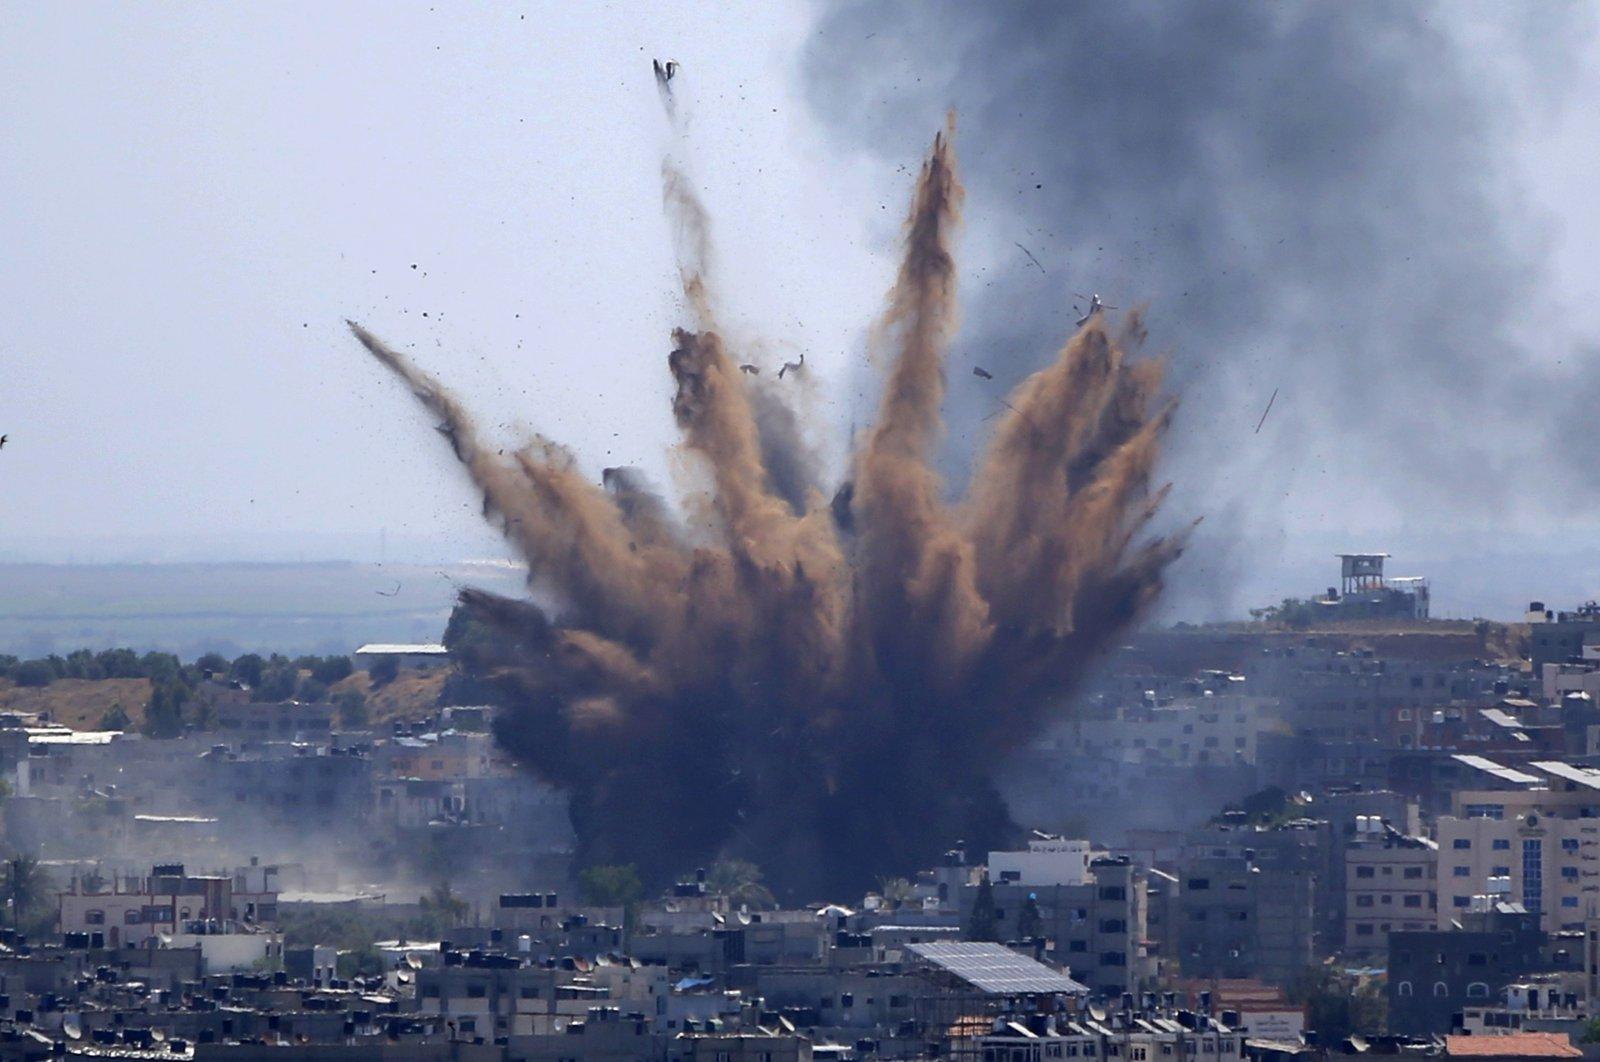 Smoke rises following Israeli airstrikes on a building in Gaza, Palestine, May 13, 2021. (AP Photo)